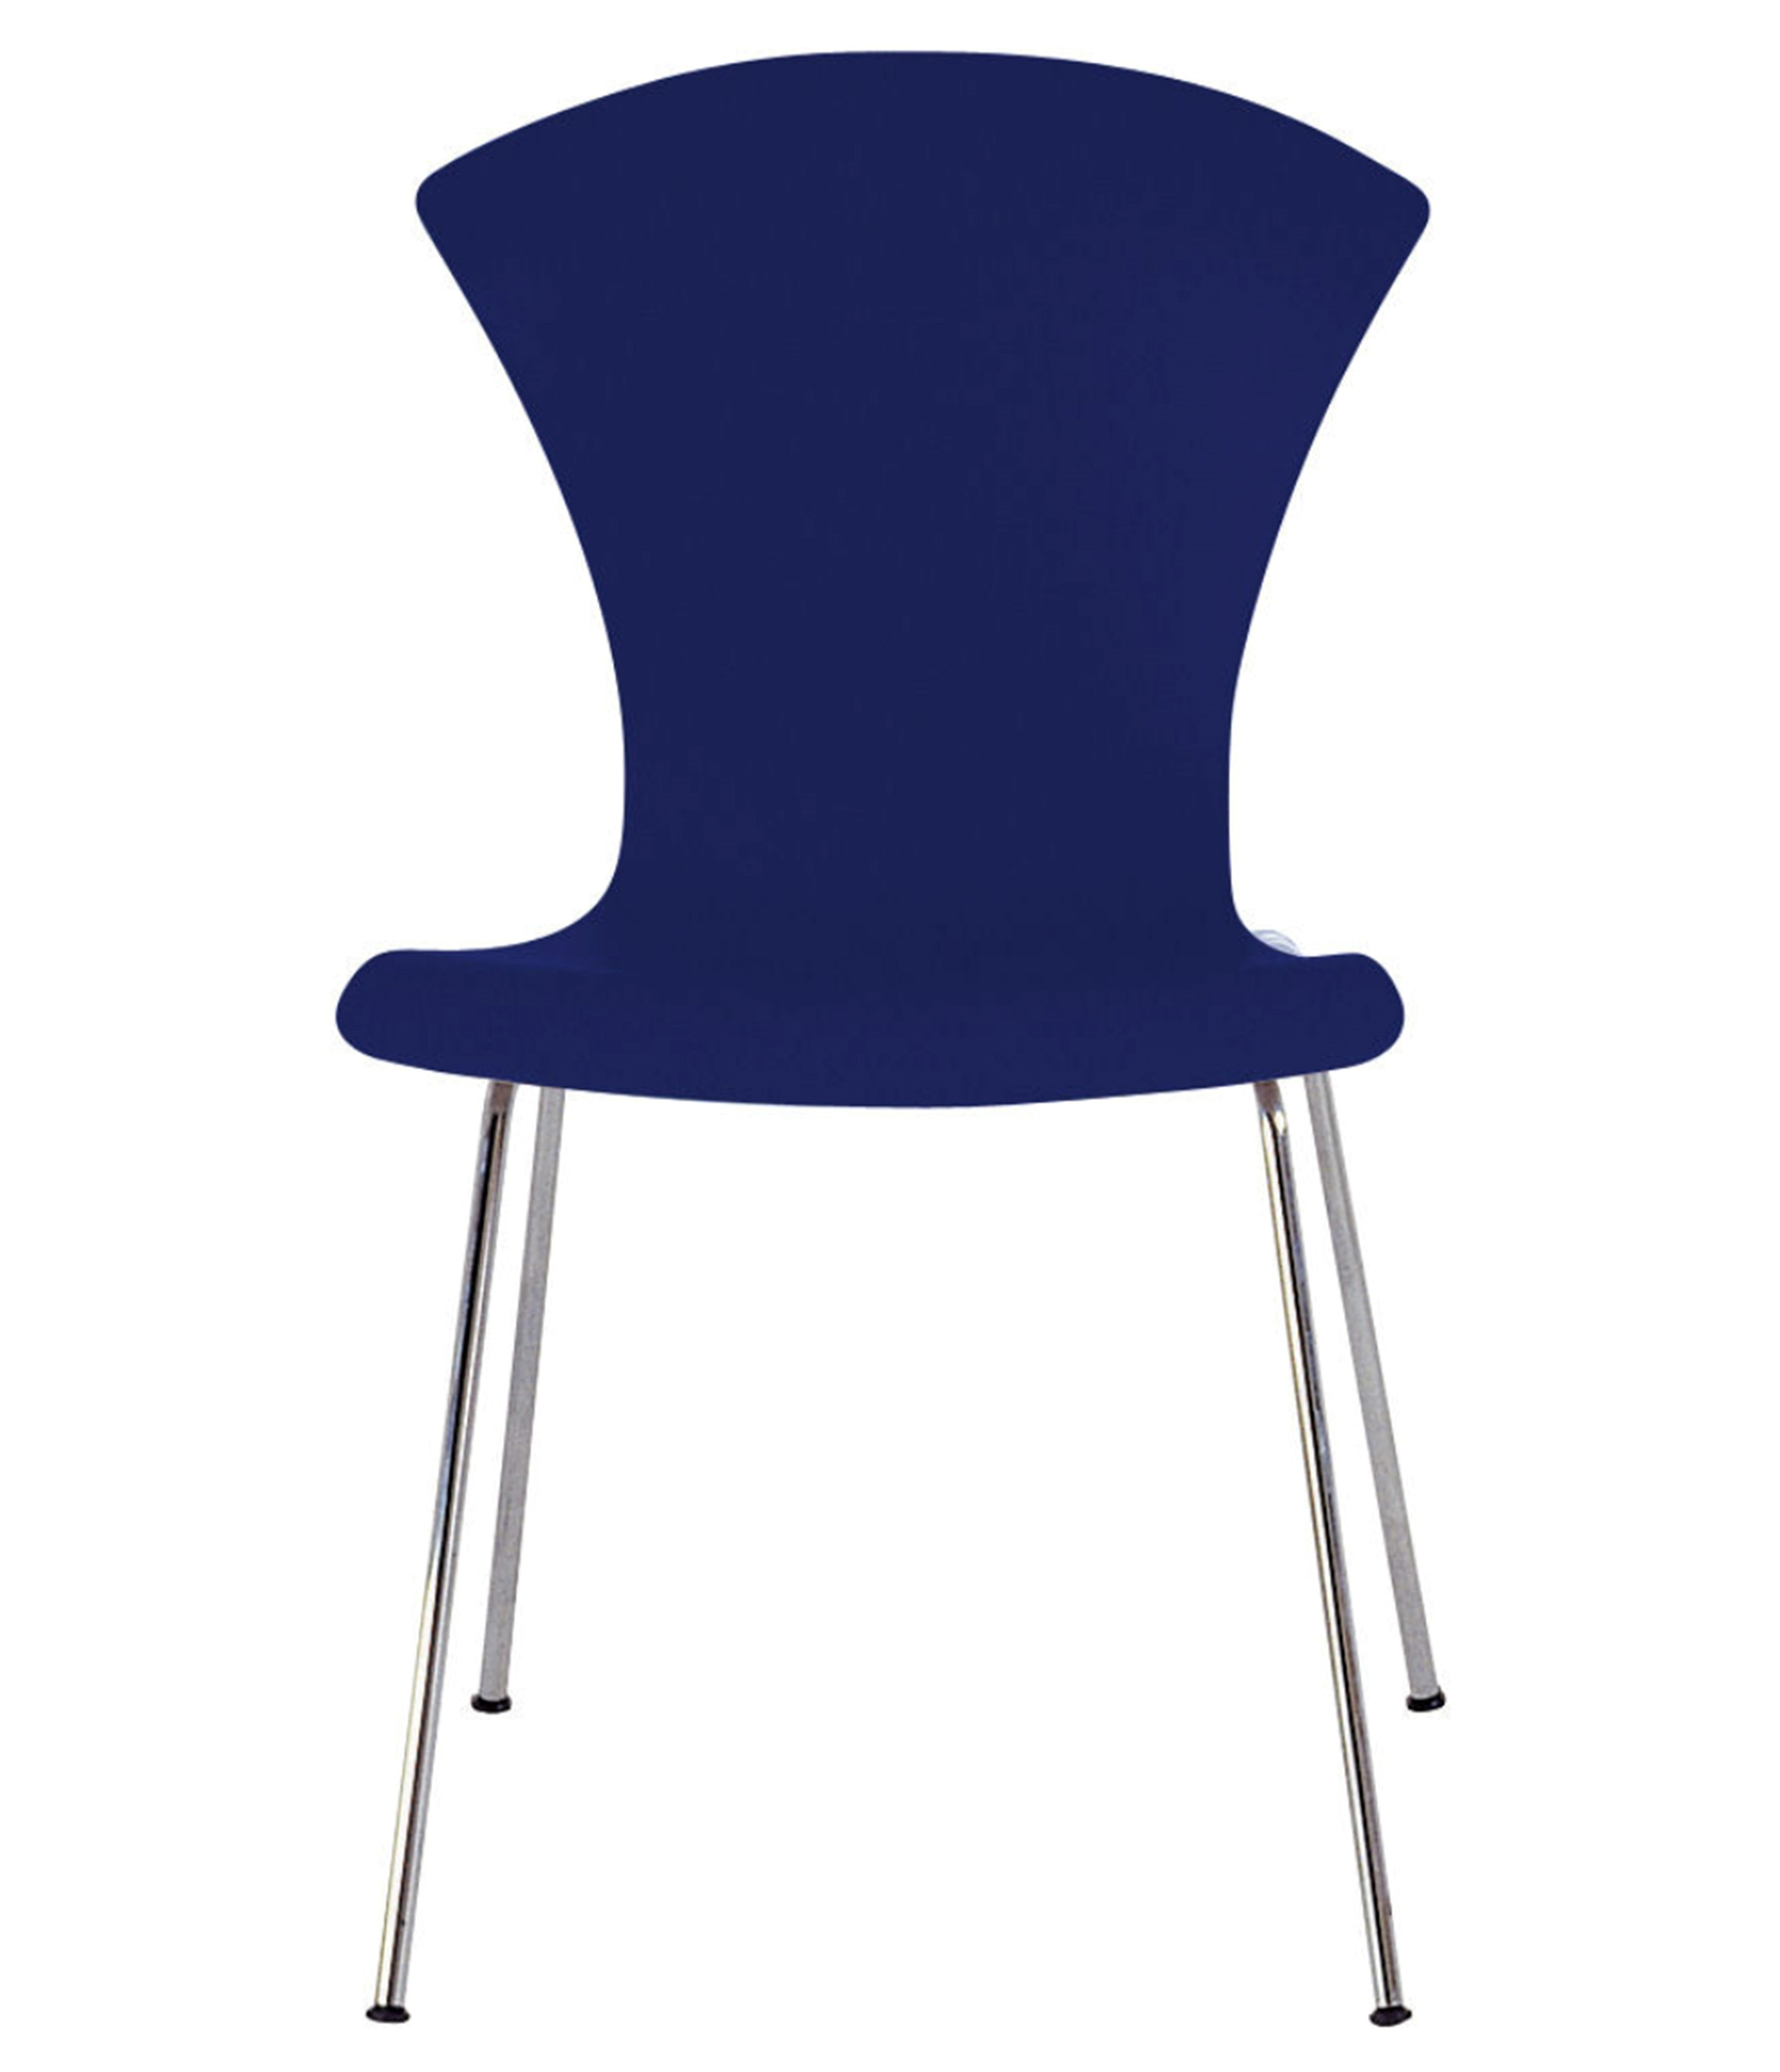 sedie kartell scontate sedie a prezzi scontati